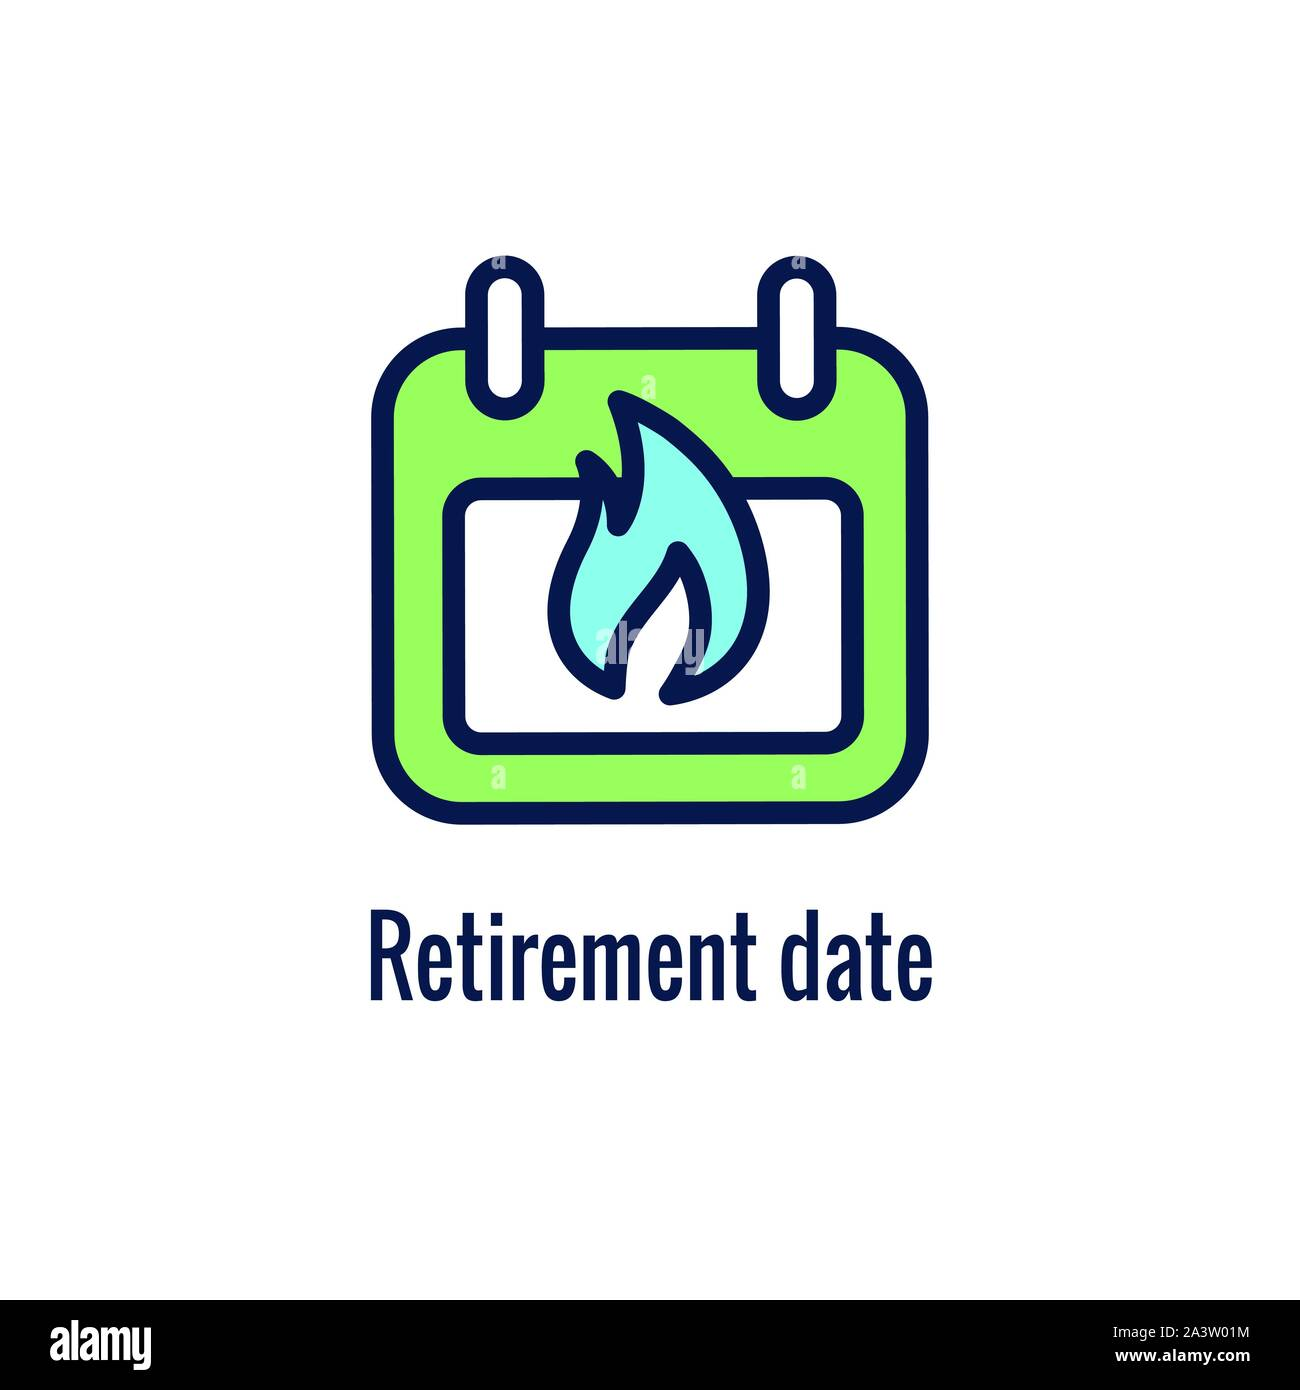 Retirement Savings Icon w retiring and monetary images Stock Vector